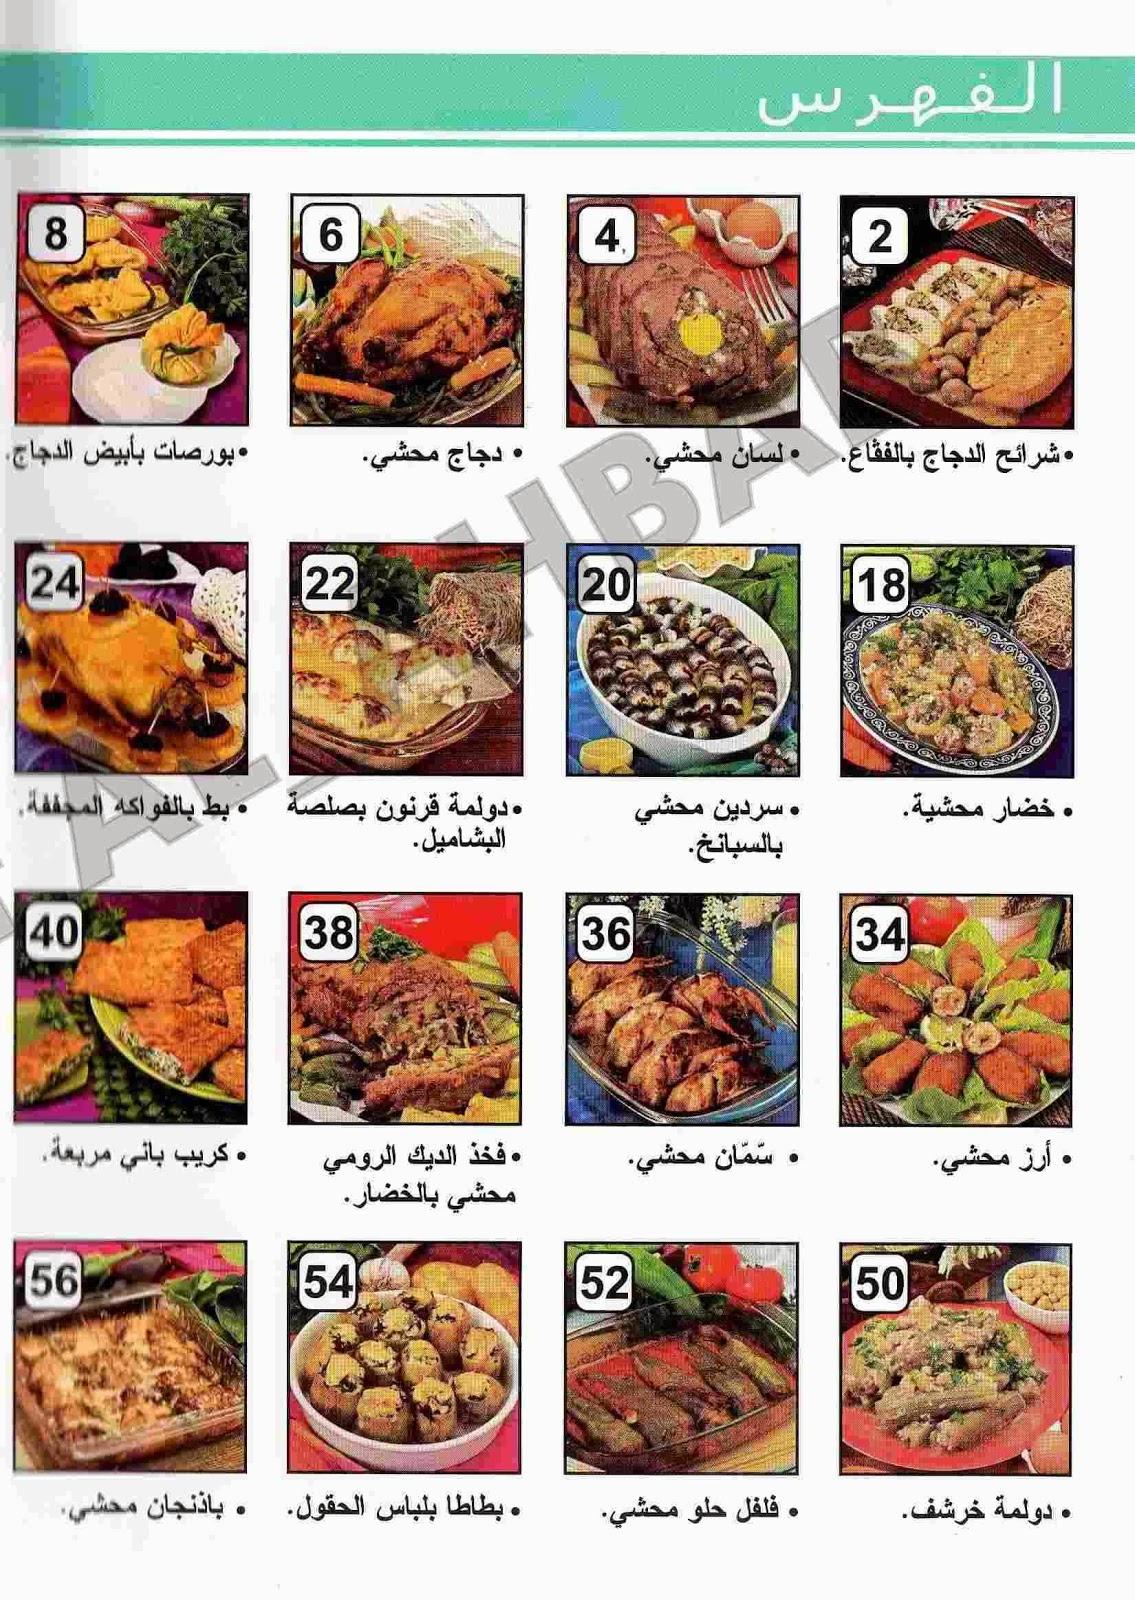 La cuisine alg rienne - La cuisine algerienne samira ...